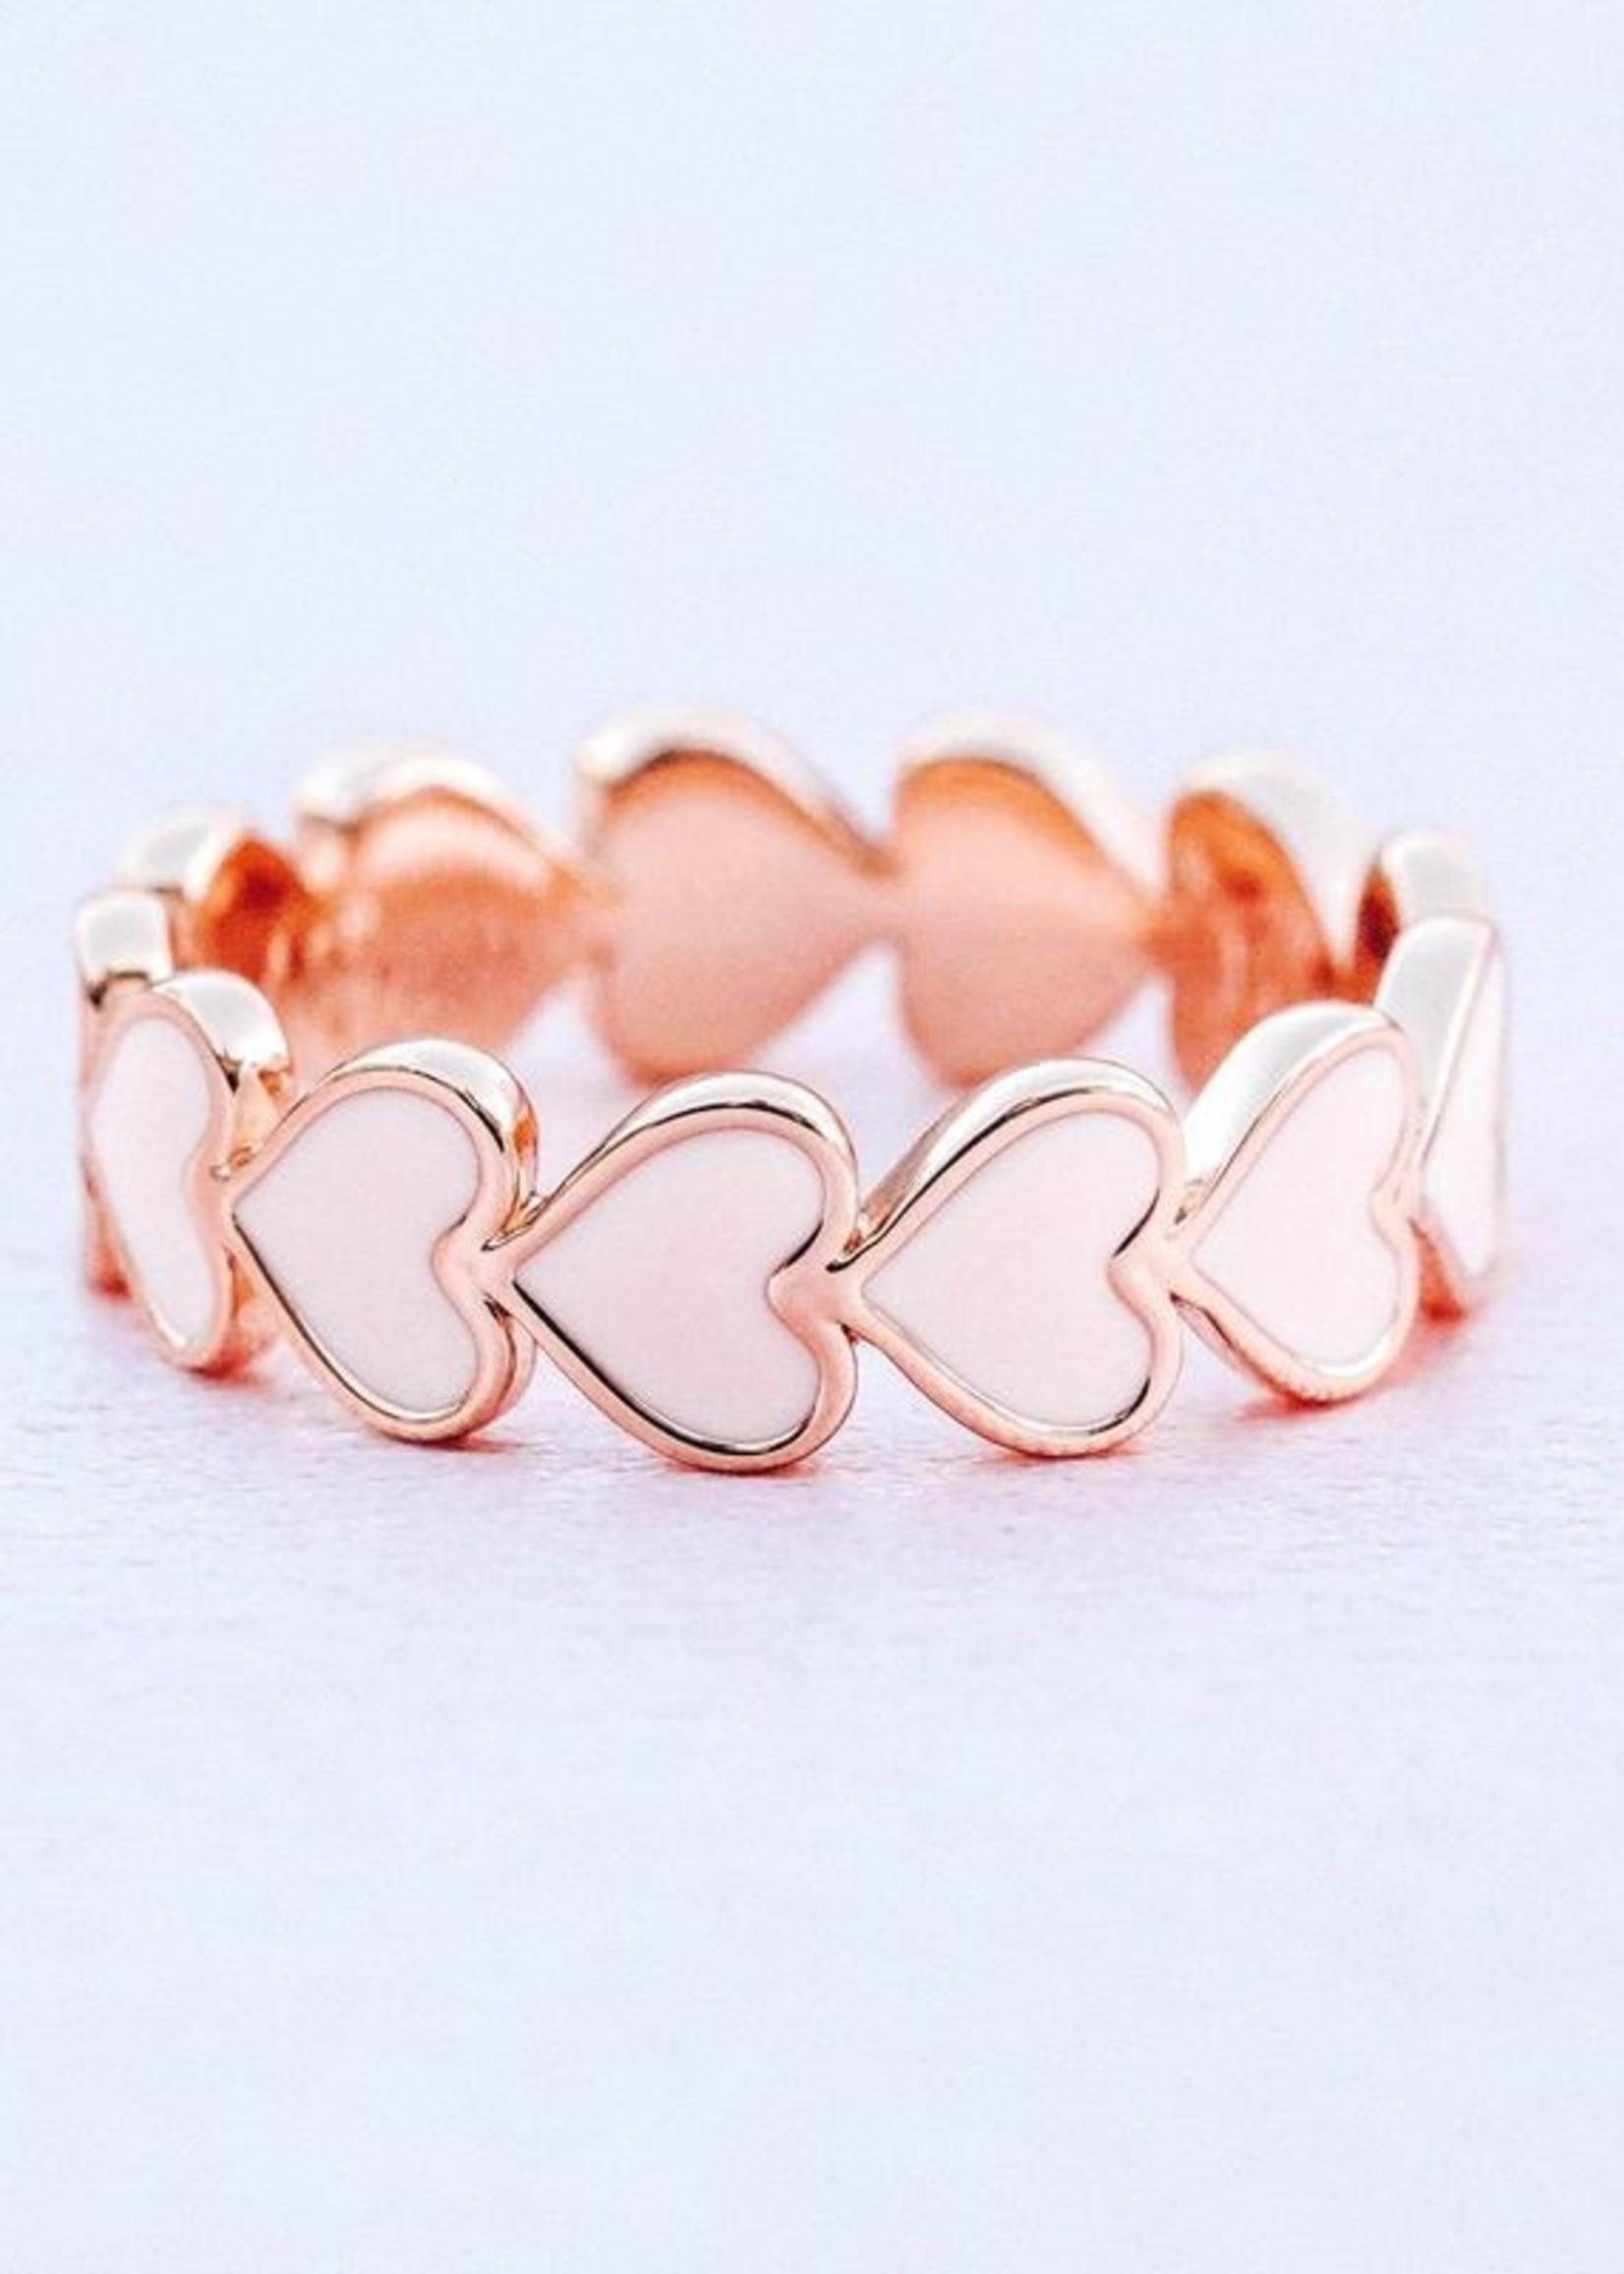 Pura Vida Hartjes Ring - platte rosé goud en roze hartjes - Pura Vida